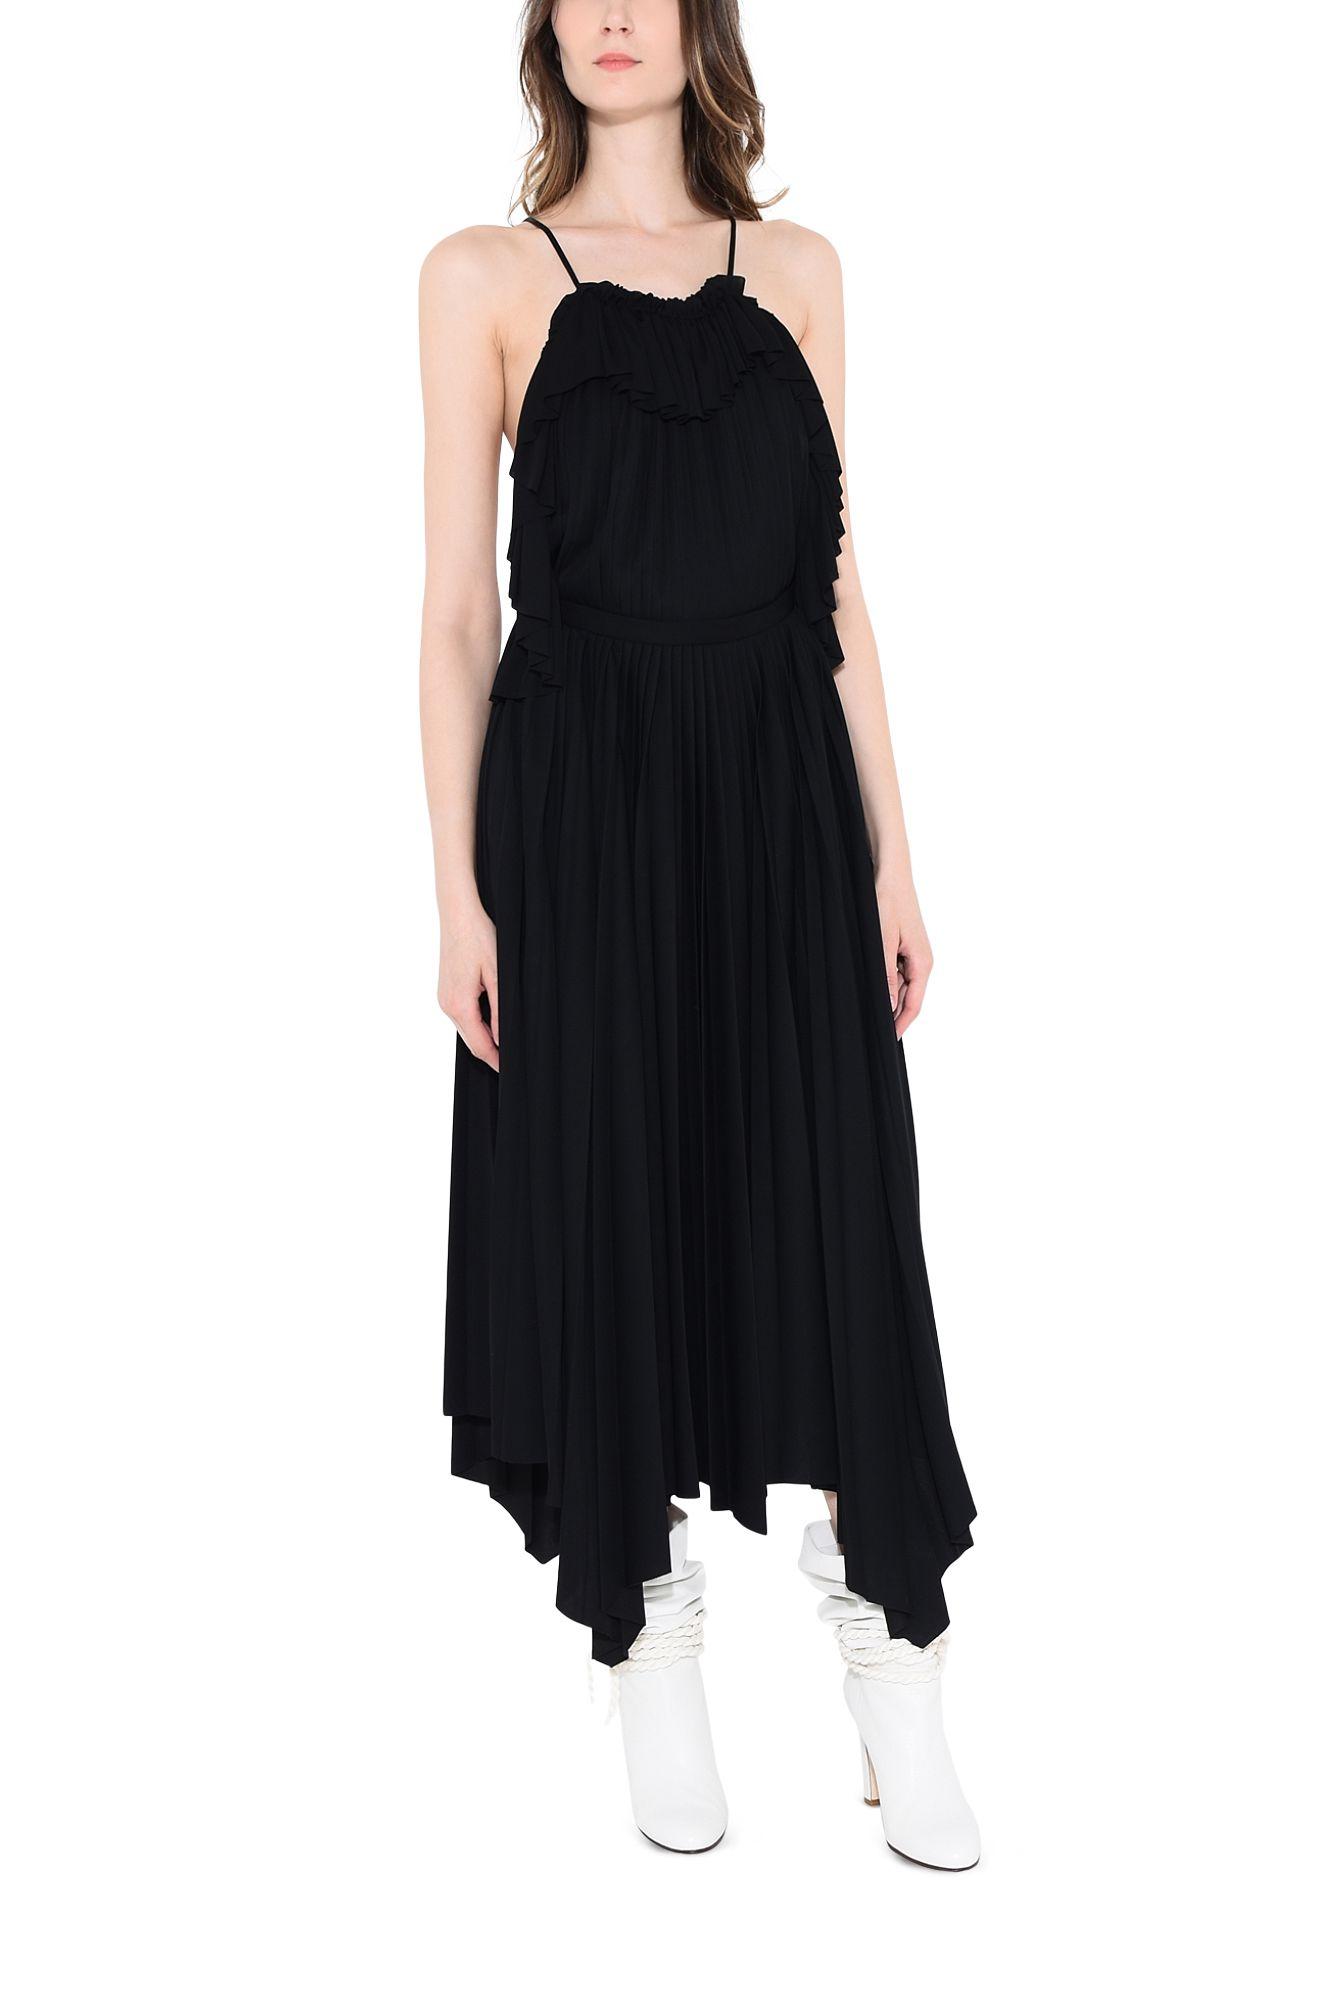 PHILOSOPHY di LORENZO SERAFINI EVENING D CORSAIR BLACK DRESS r